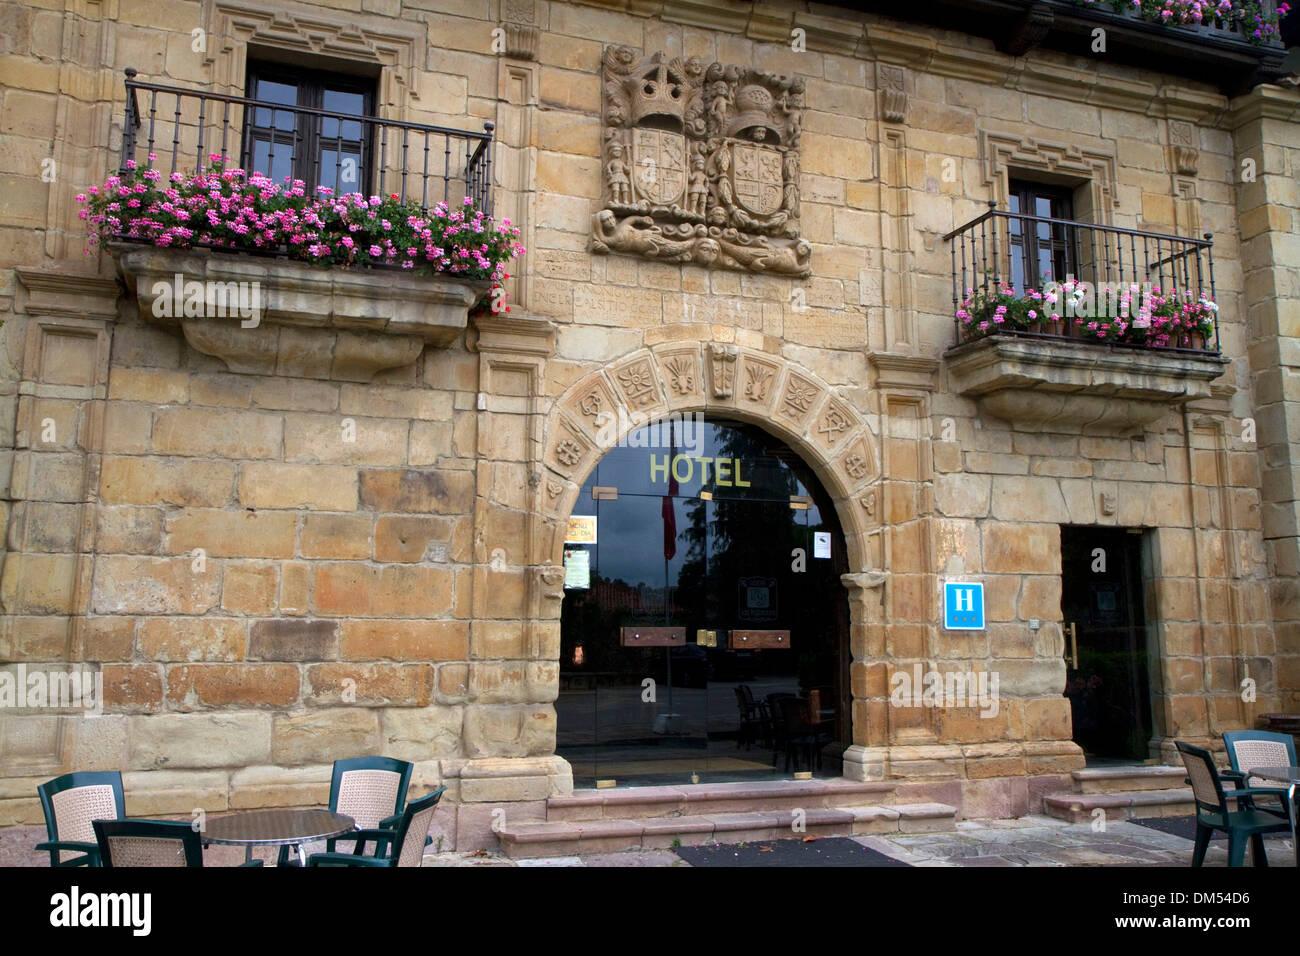 Hotel exterior at Santillana de Mar, Cantabria, Spain. - Stock Image